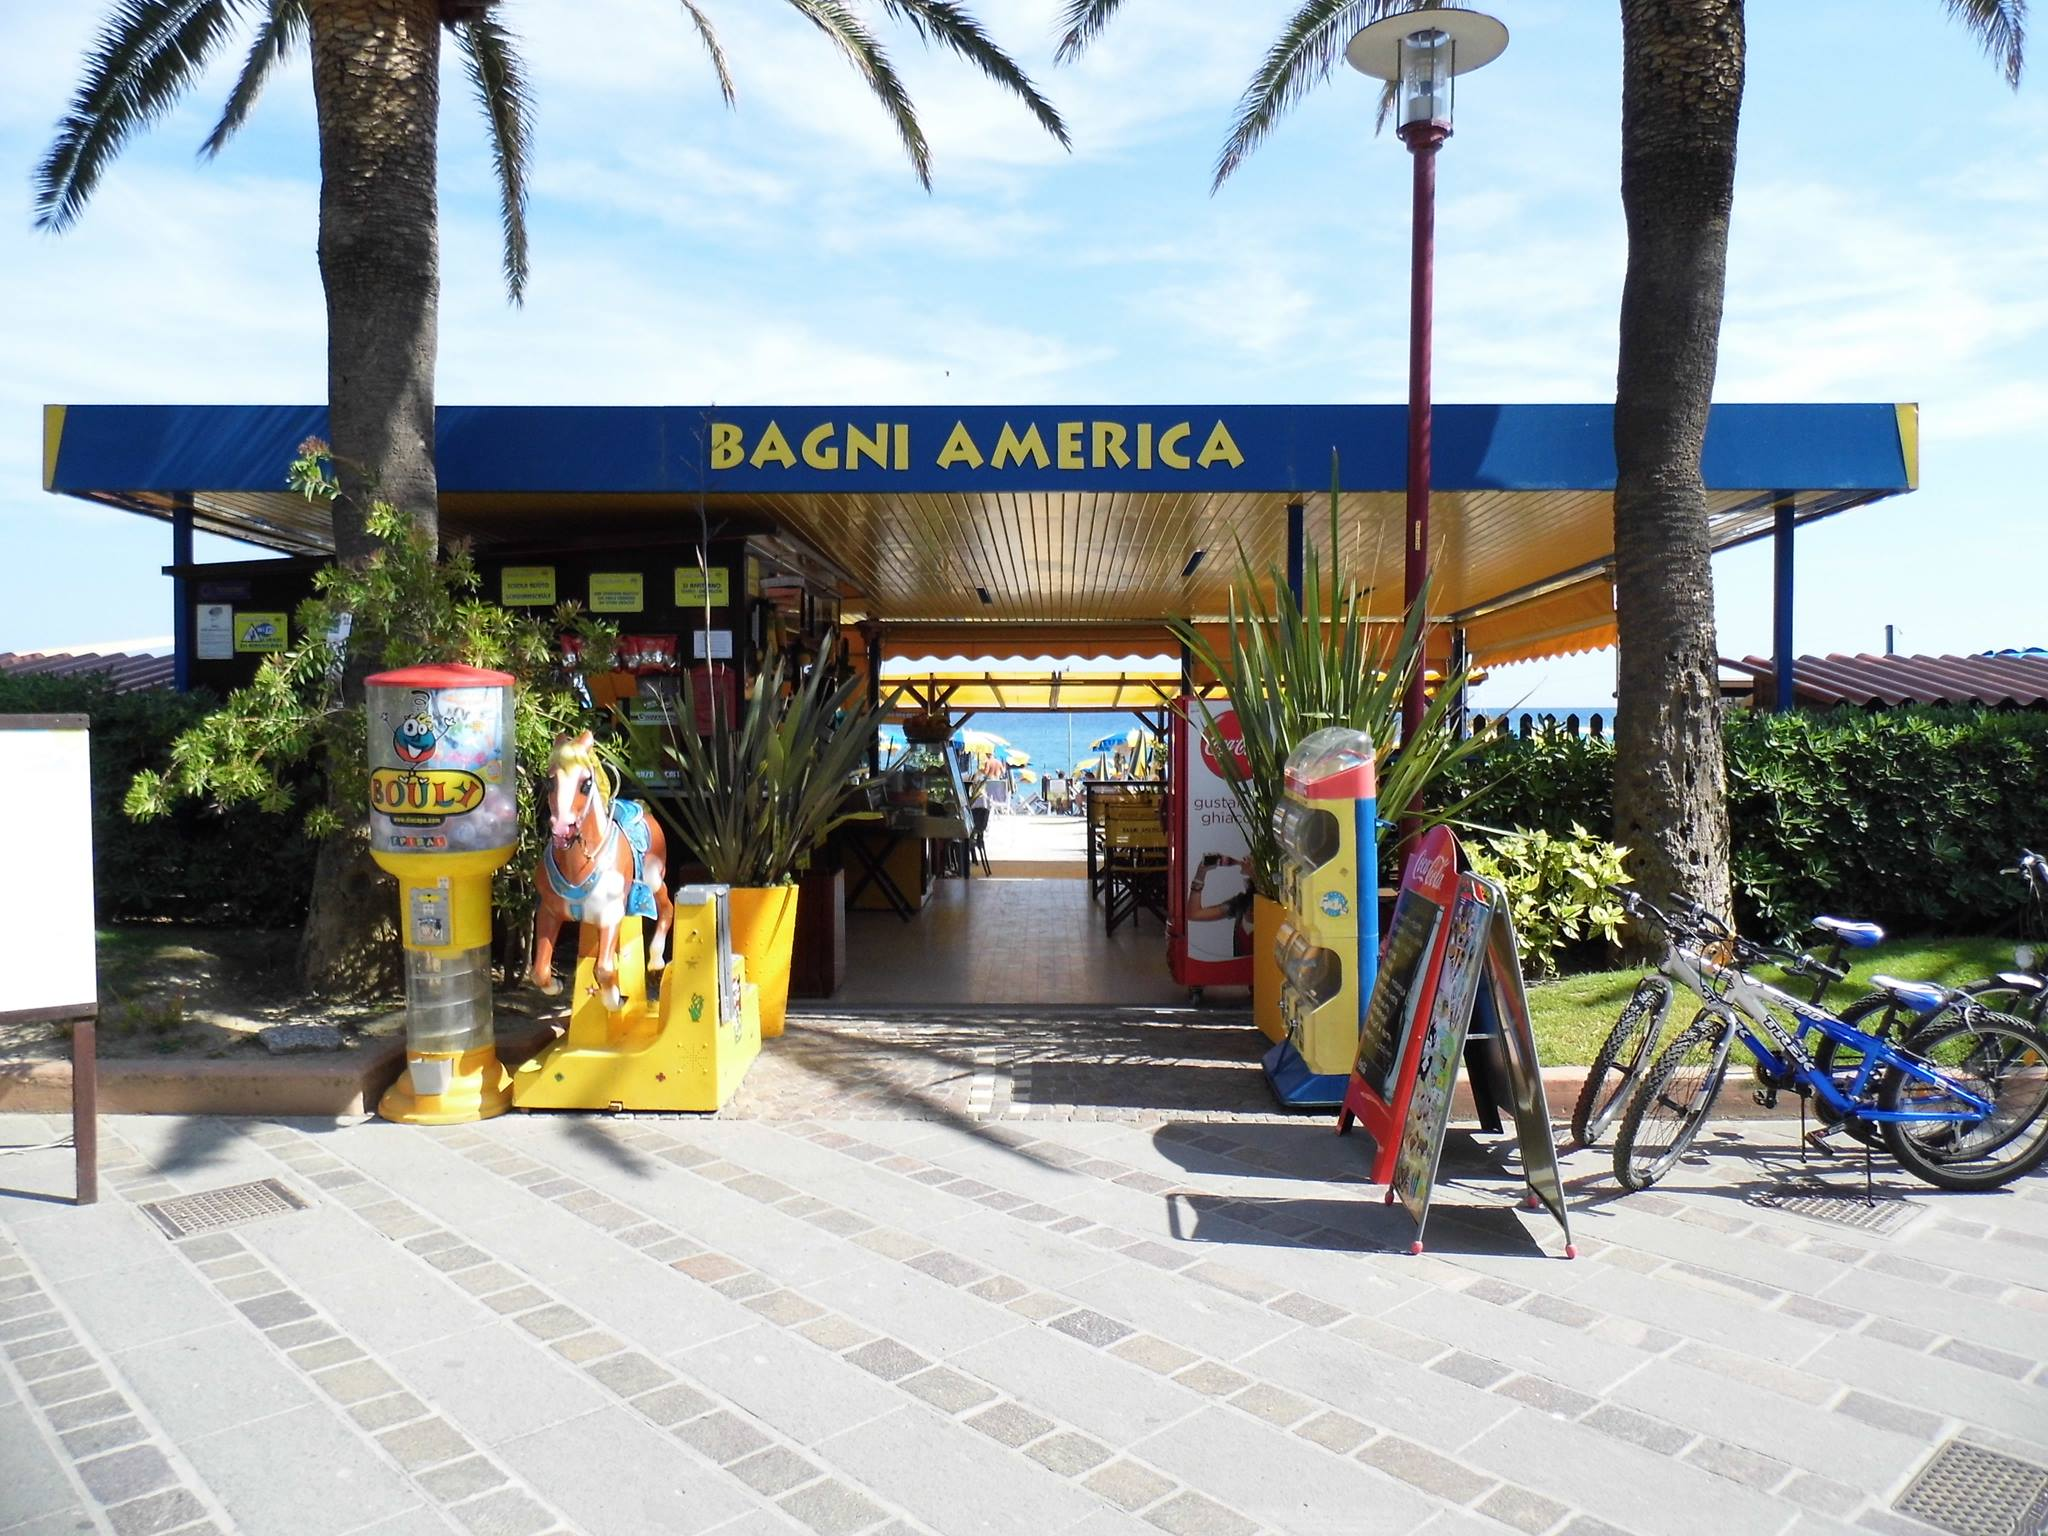 Bagni America